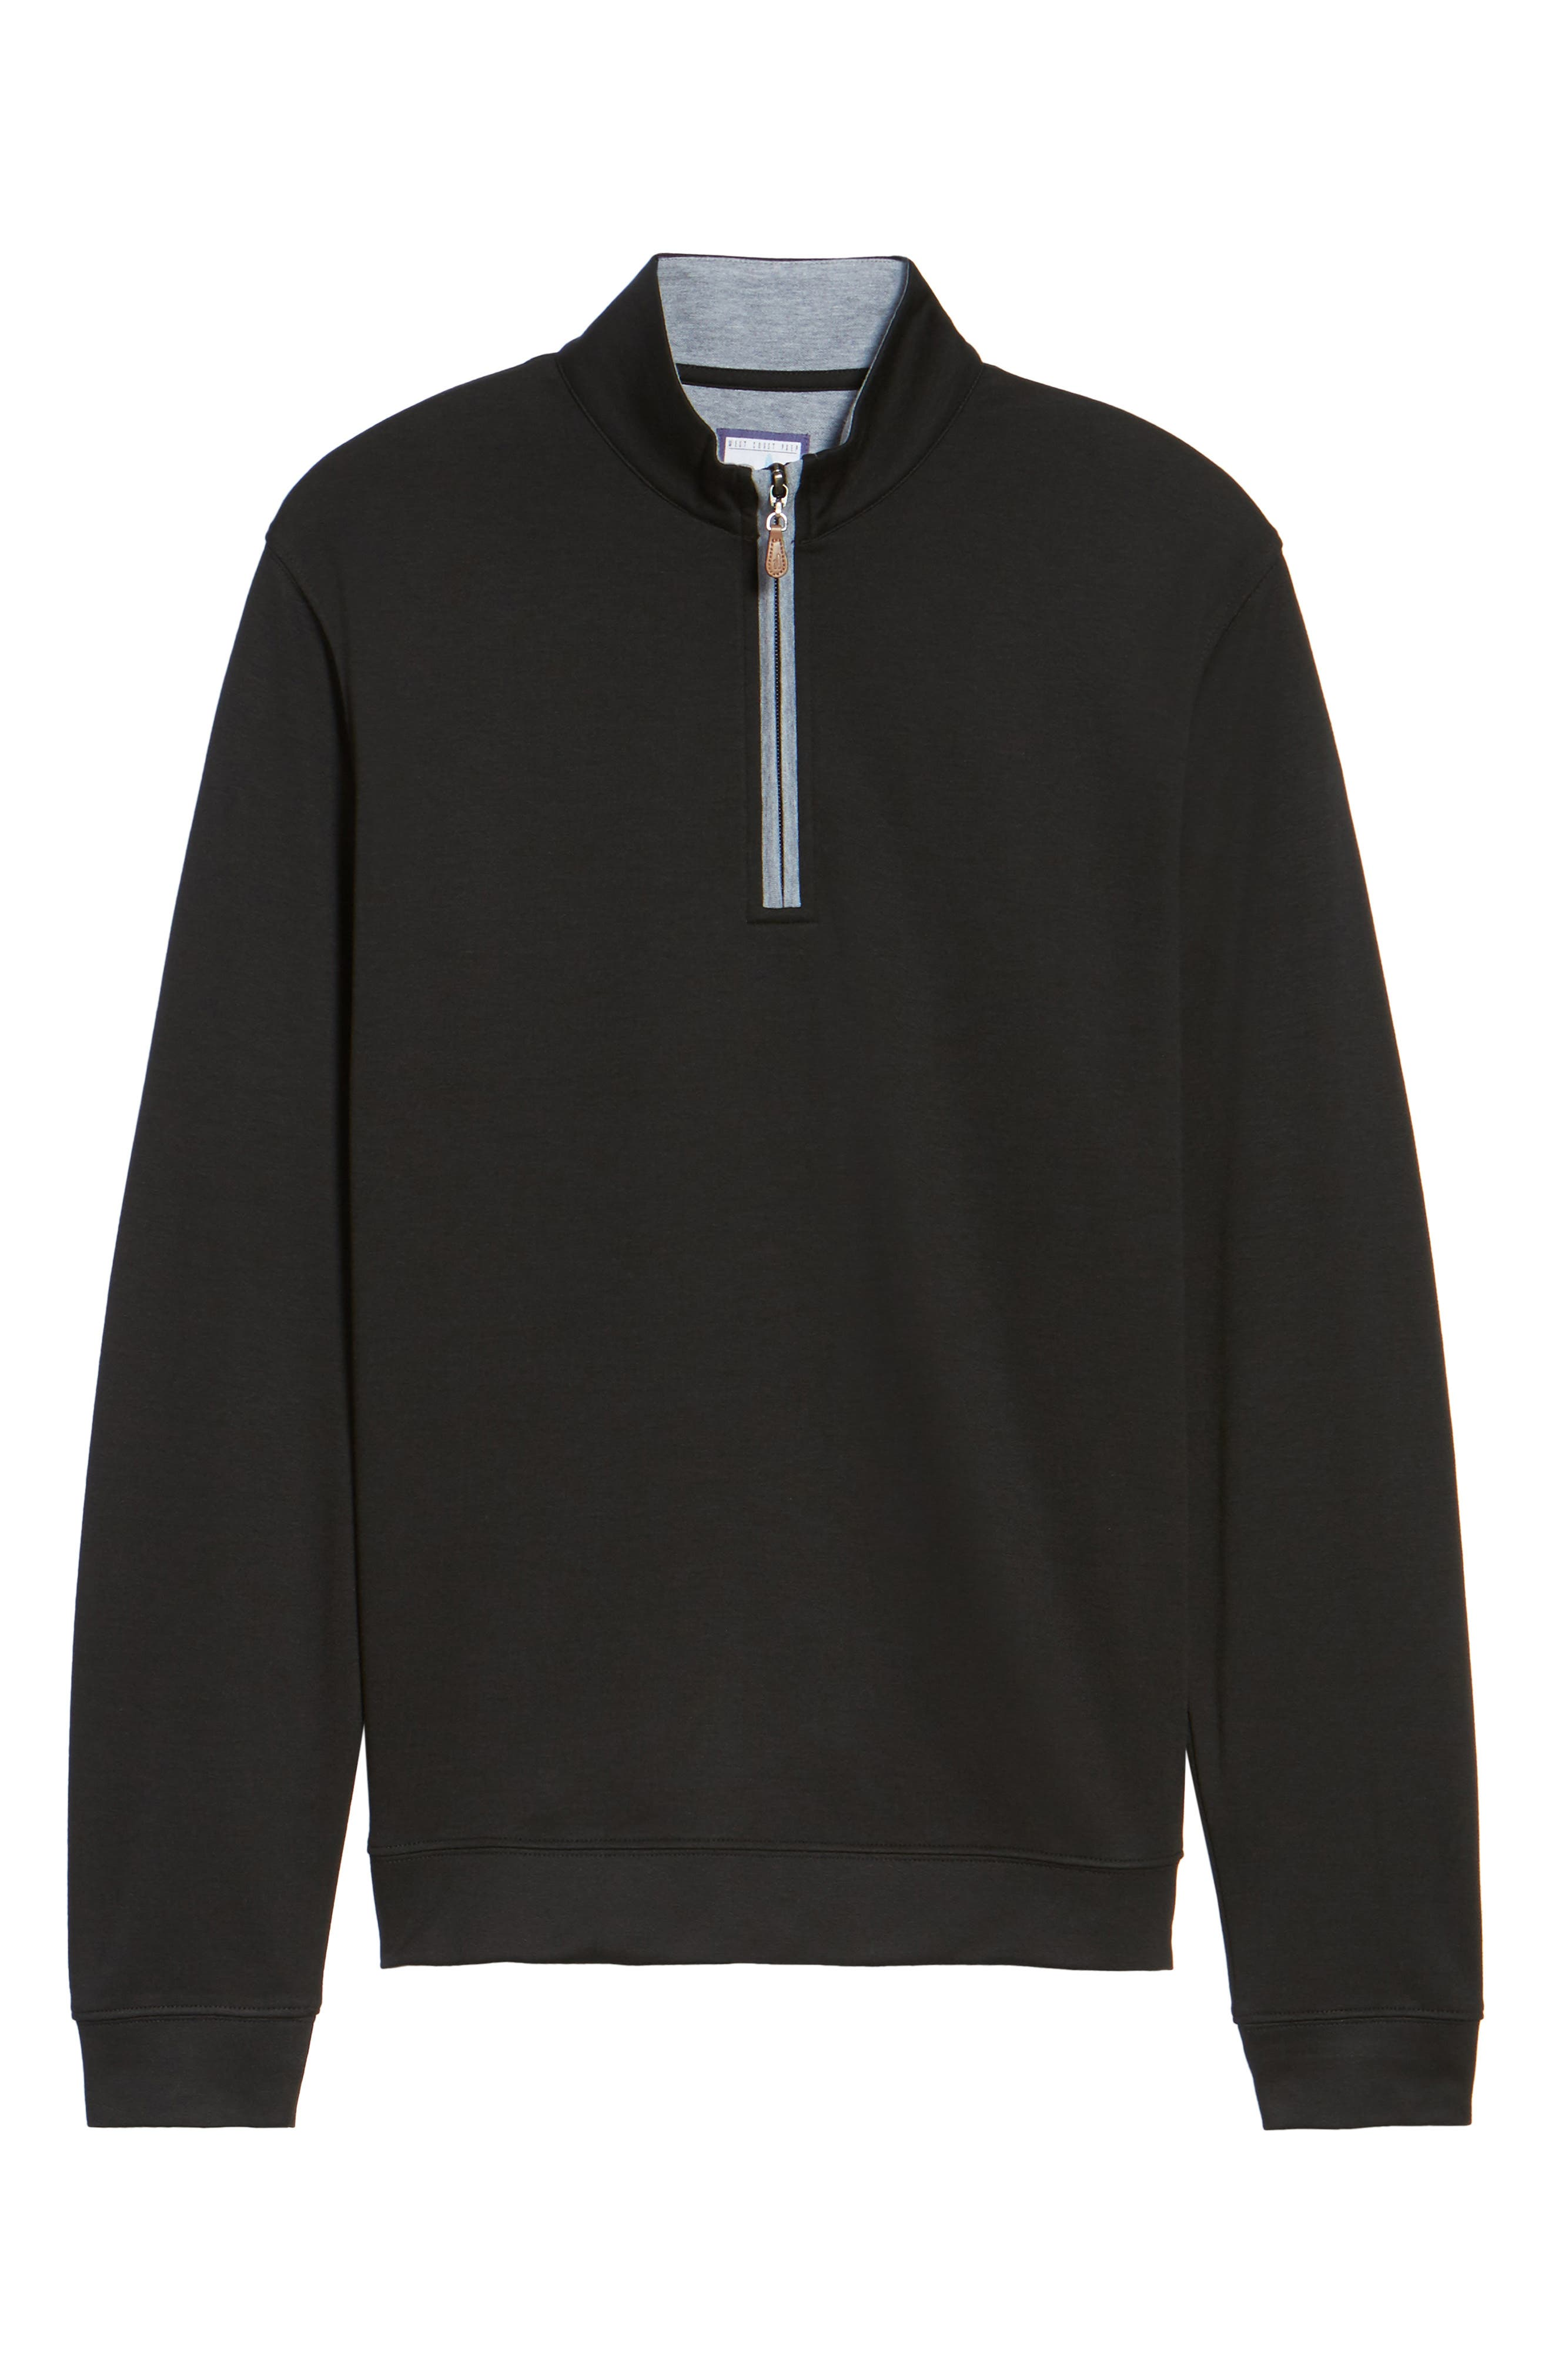 Sully Quarter Zip Pullover,                             Alternate thumbnail 6, color,                             BLACK